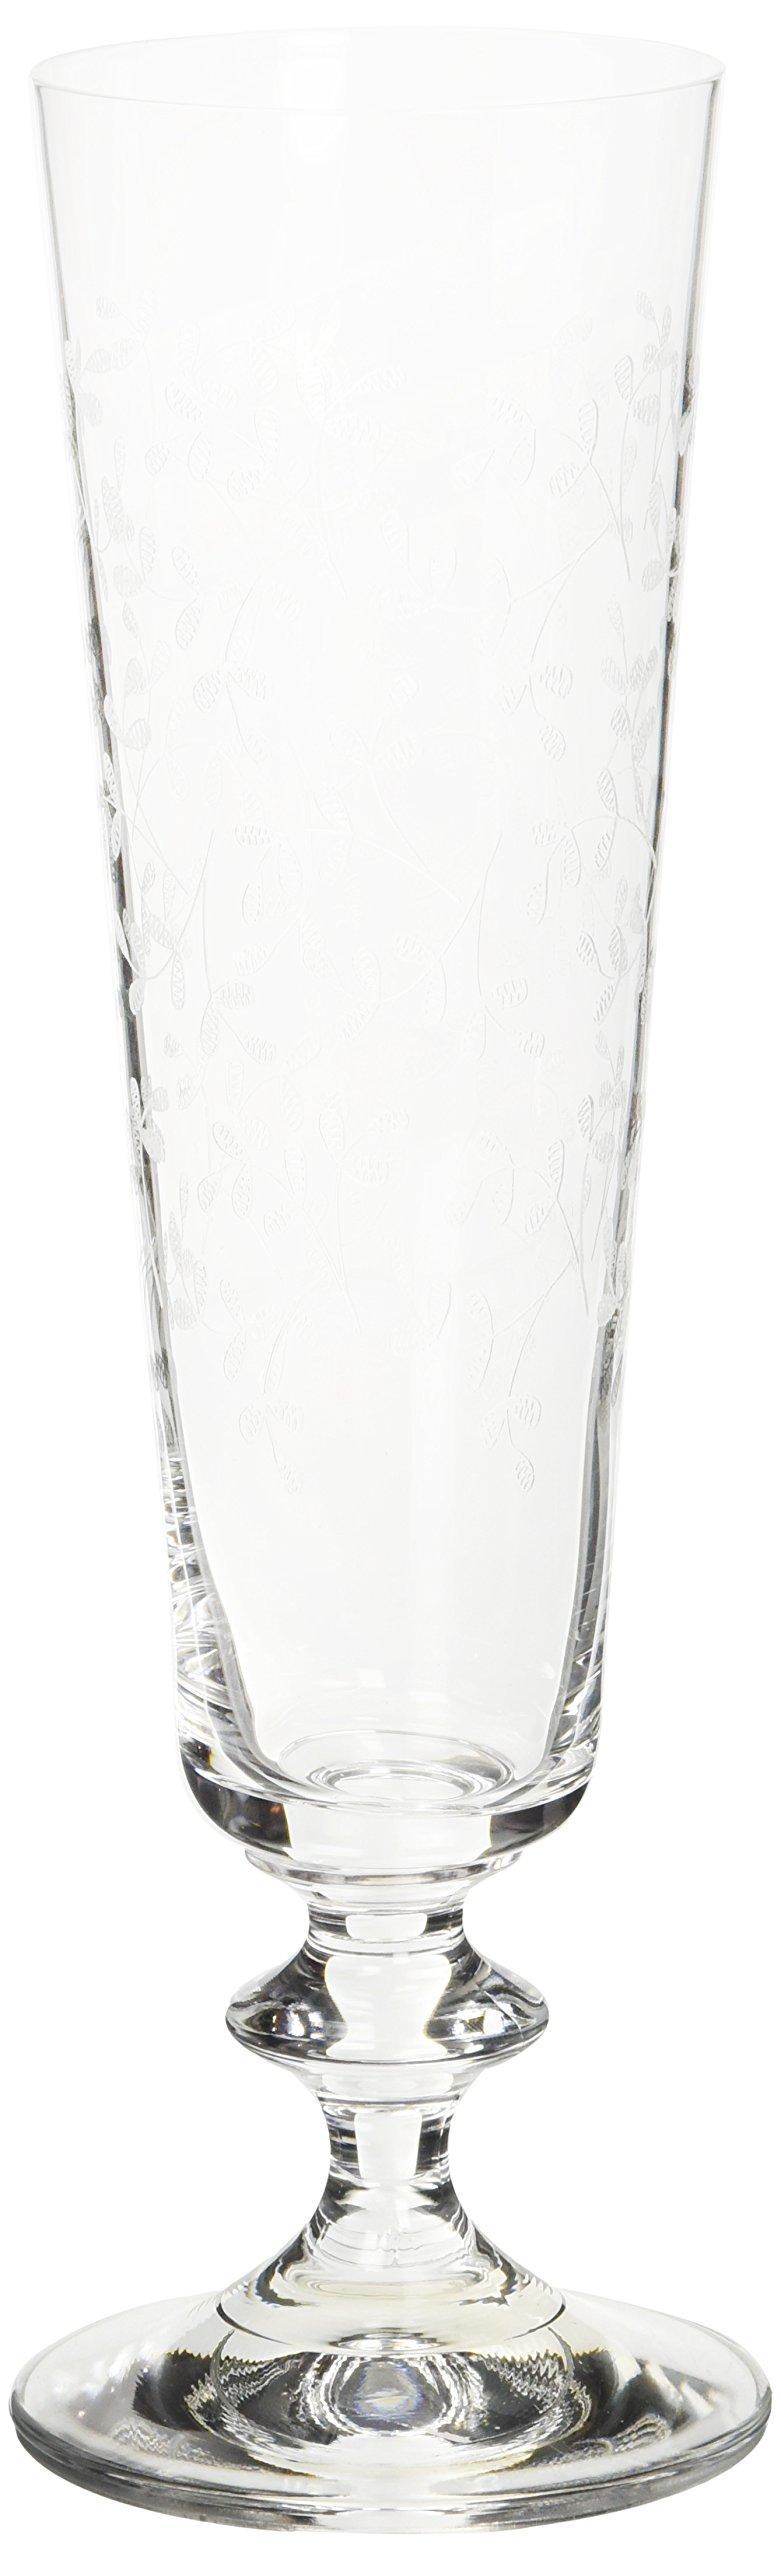 Bohemia Cristal Provence - Copas de cava (6 unidades, 205 ml) product image